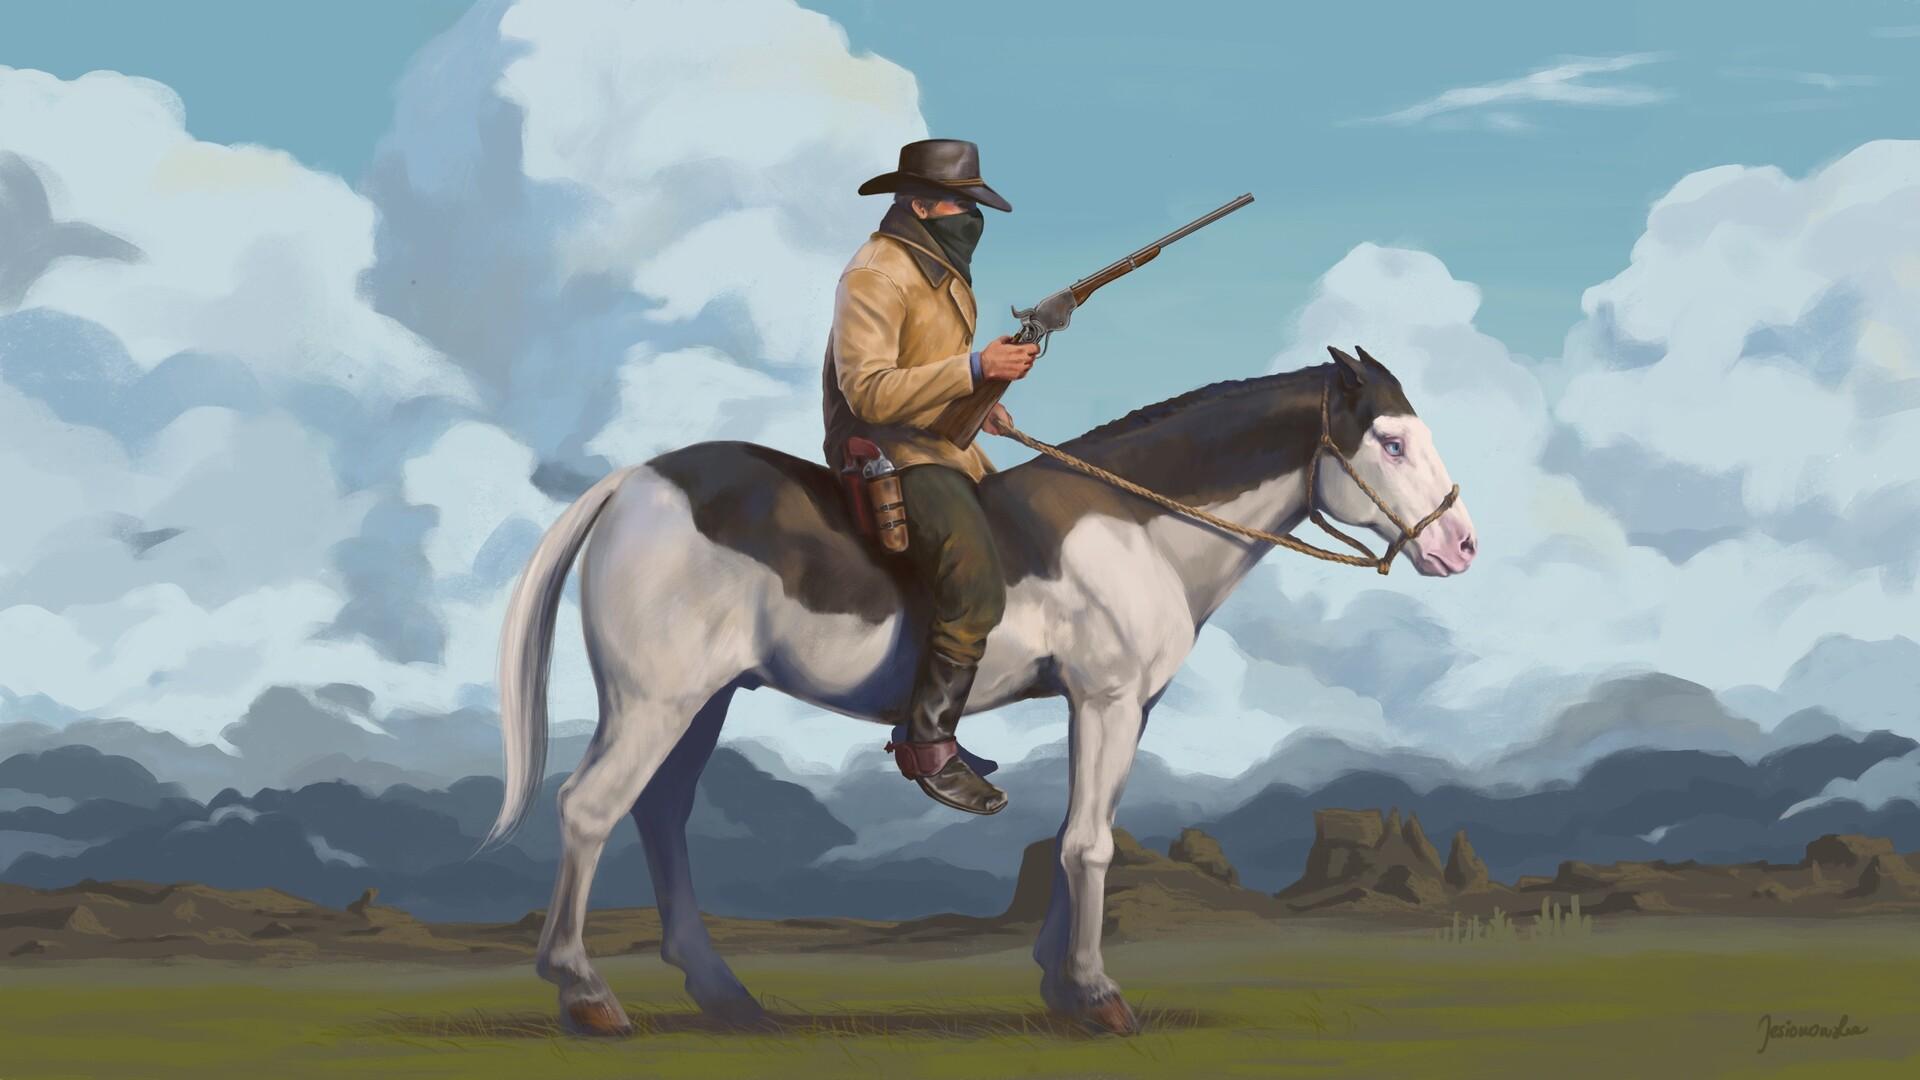 Artstation Outlaw Arthur Morgan On A Wild Horse Joanna Jesionowska